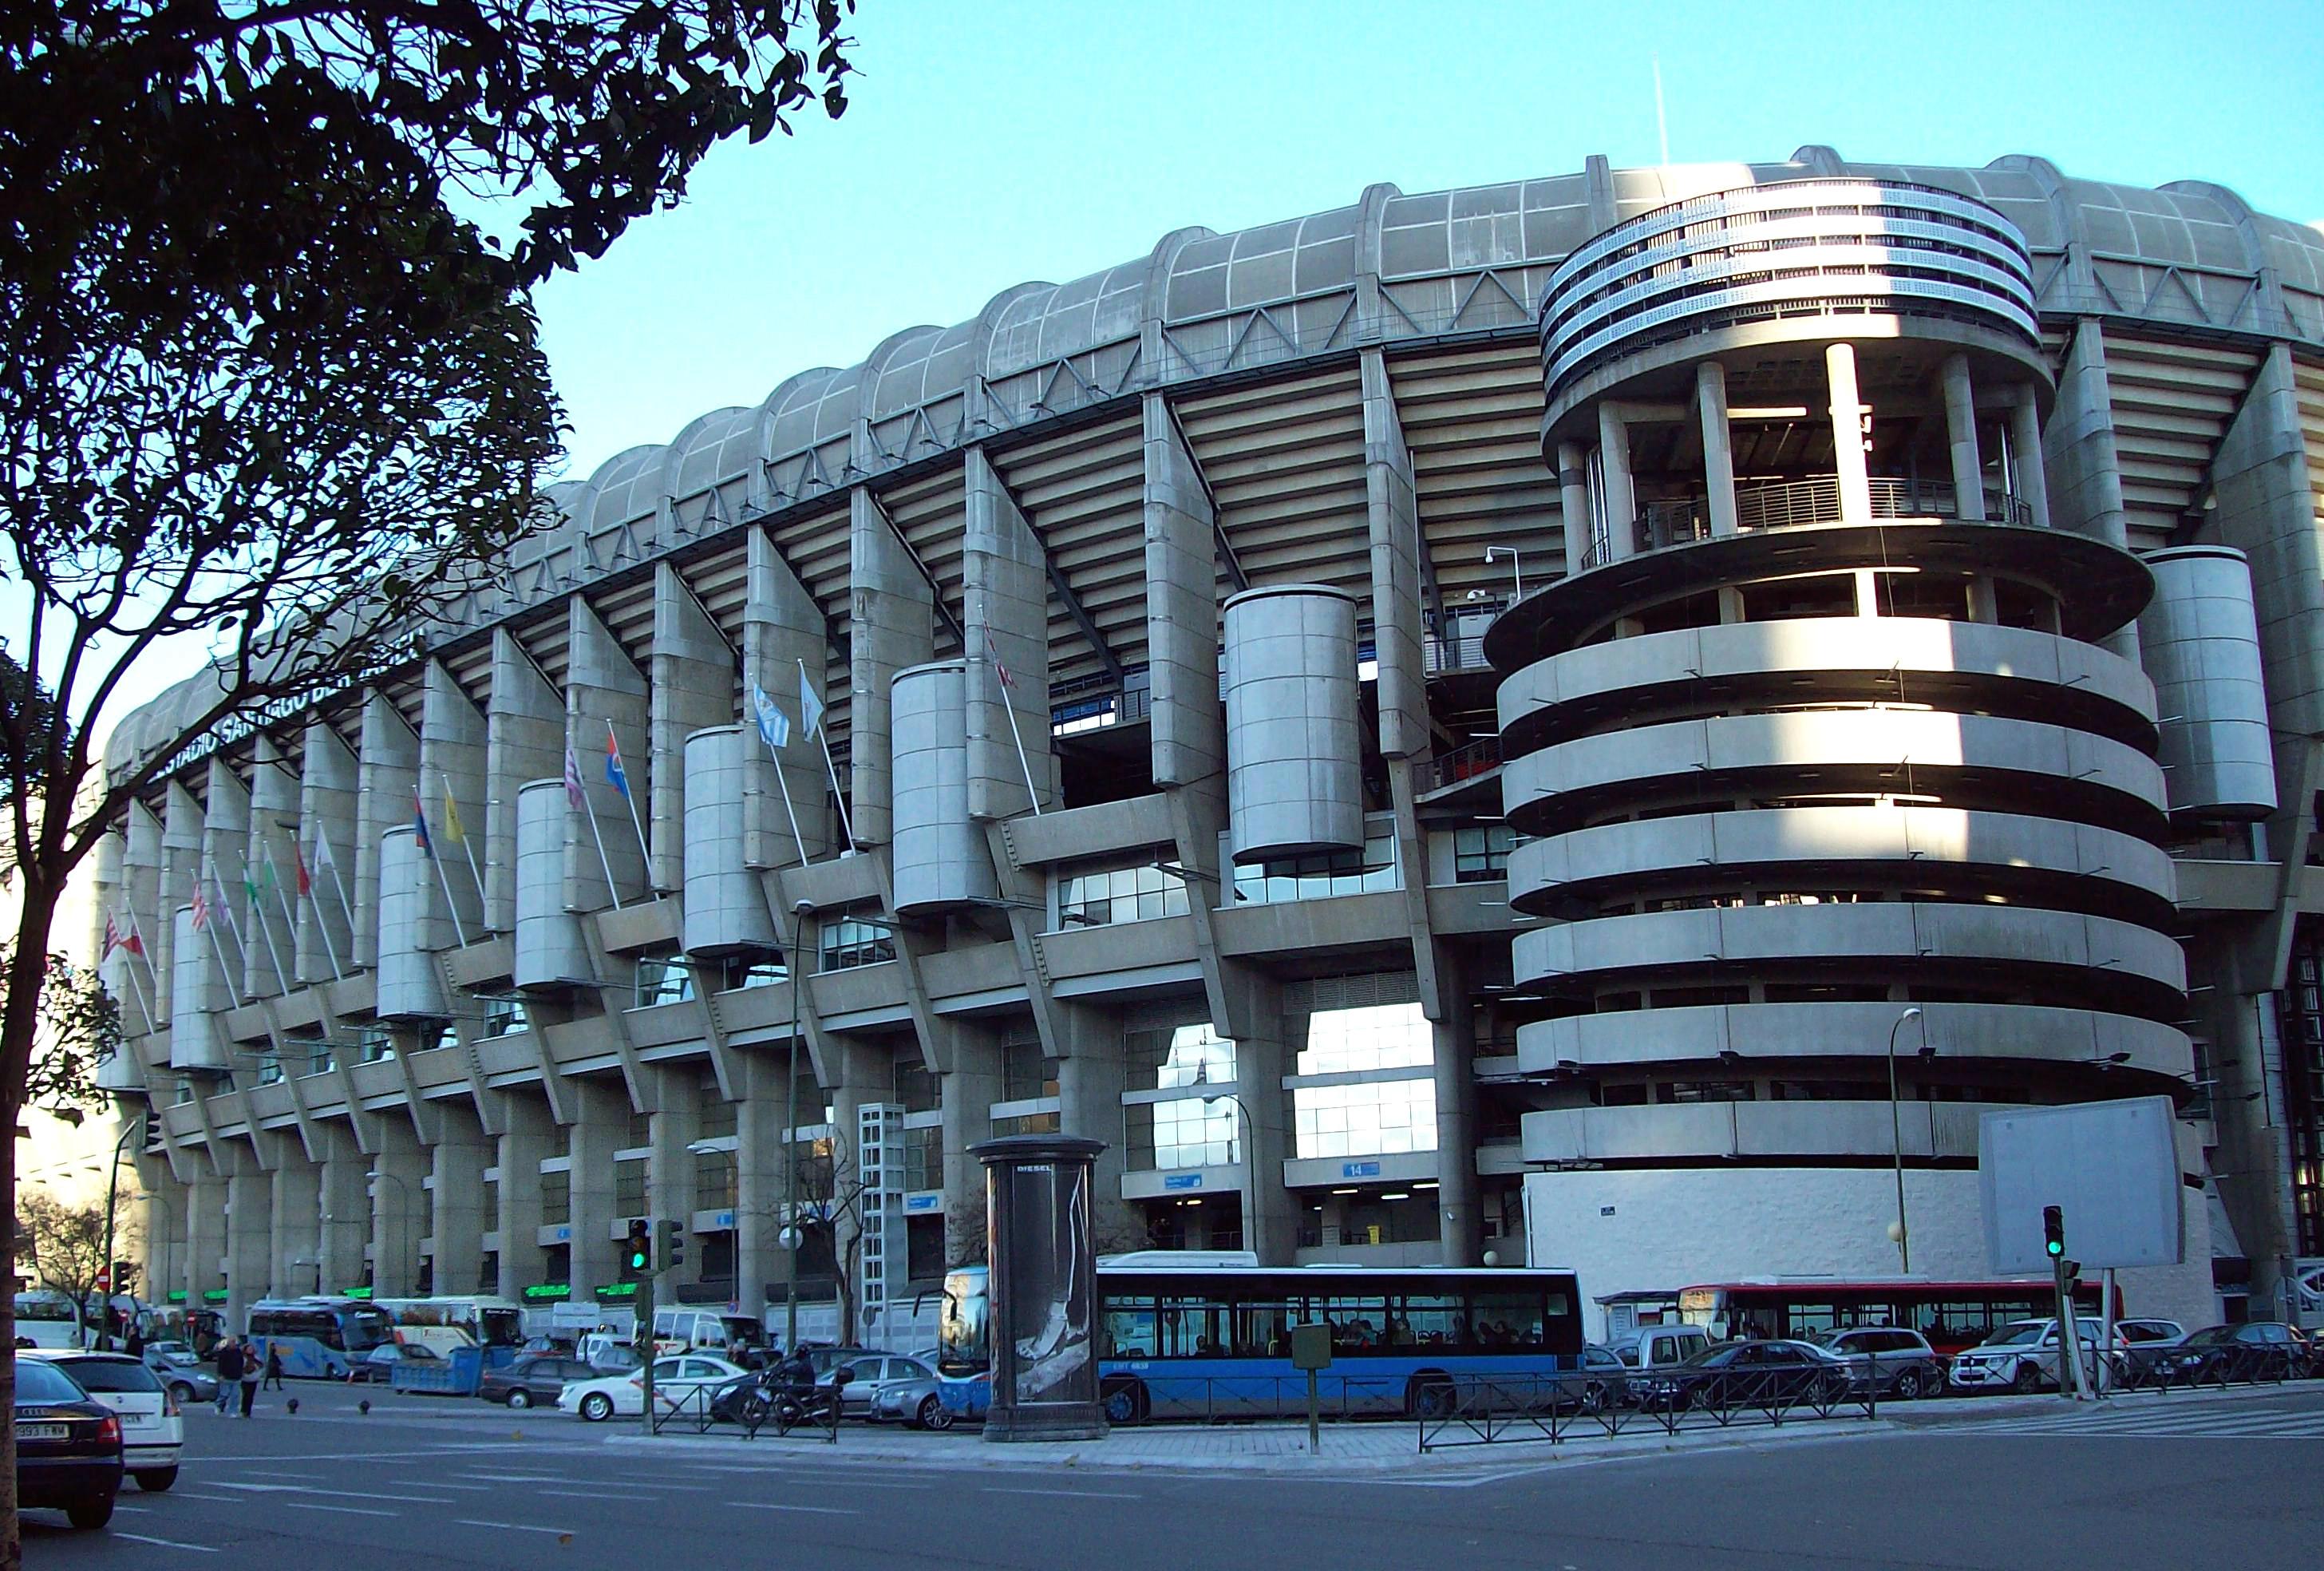 Estadio_Santiago_Bernab%C3%A9u_05.jpg